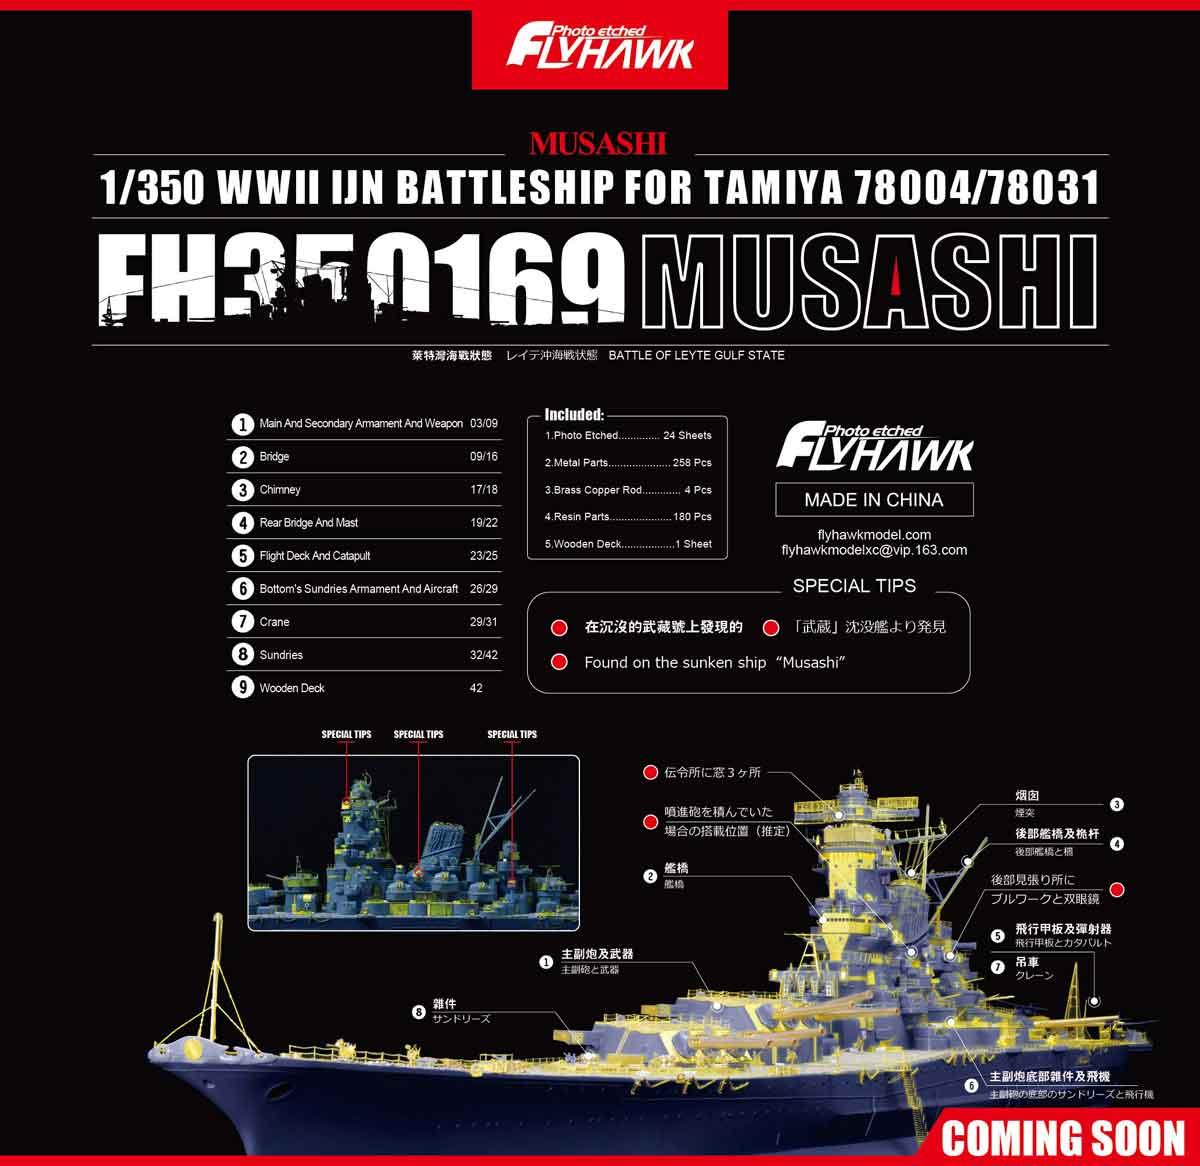 FH350169 Musashi FOR TAMIYA 78004/78031 File